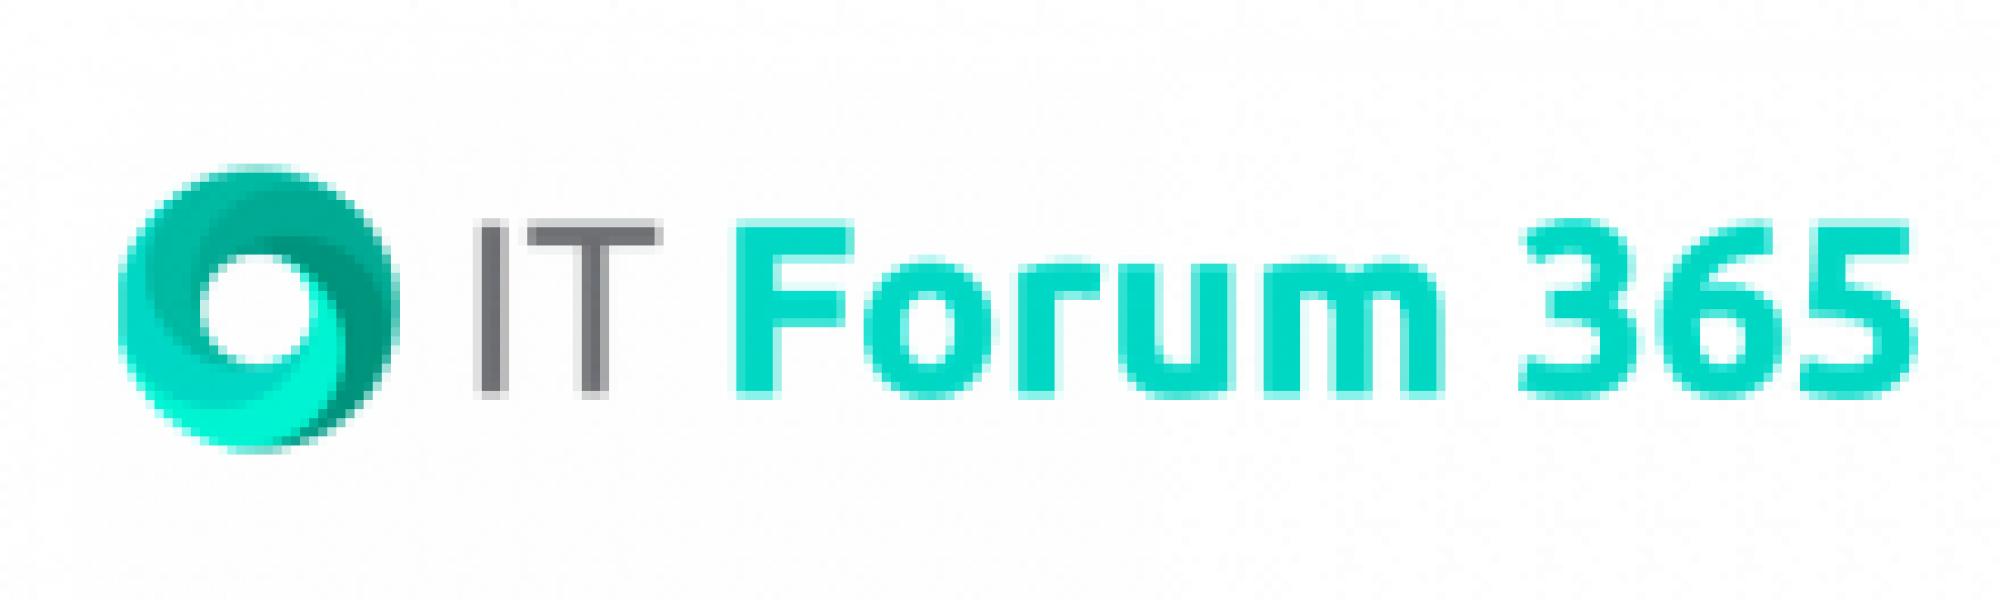 it-forum-romanni-hipnose-transformacional